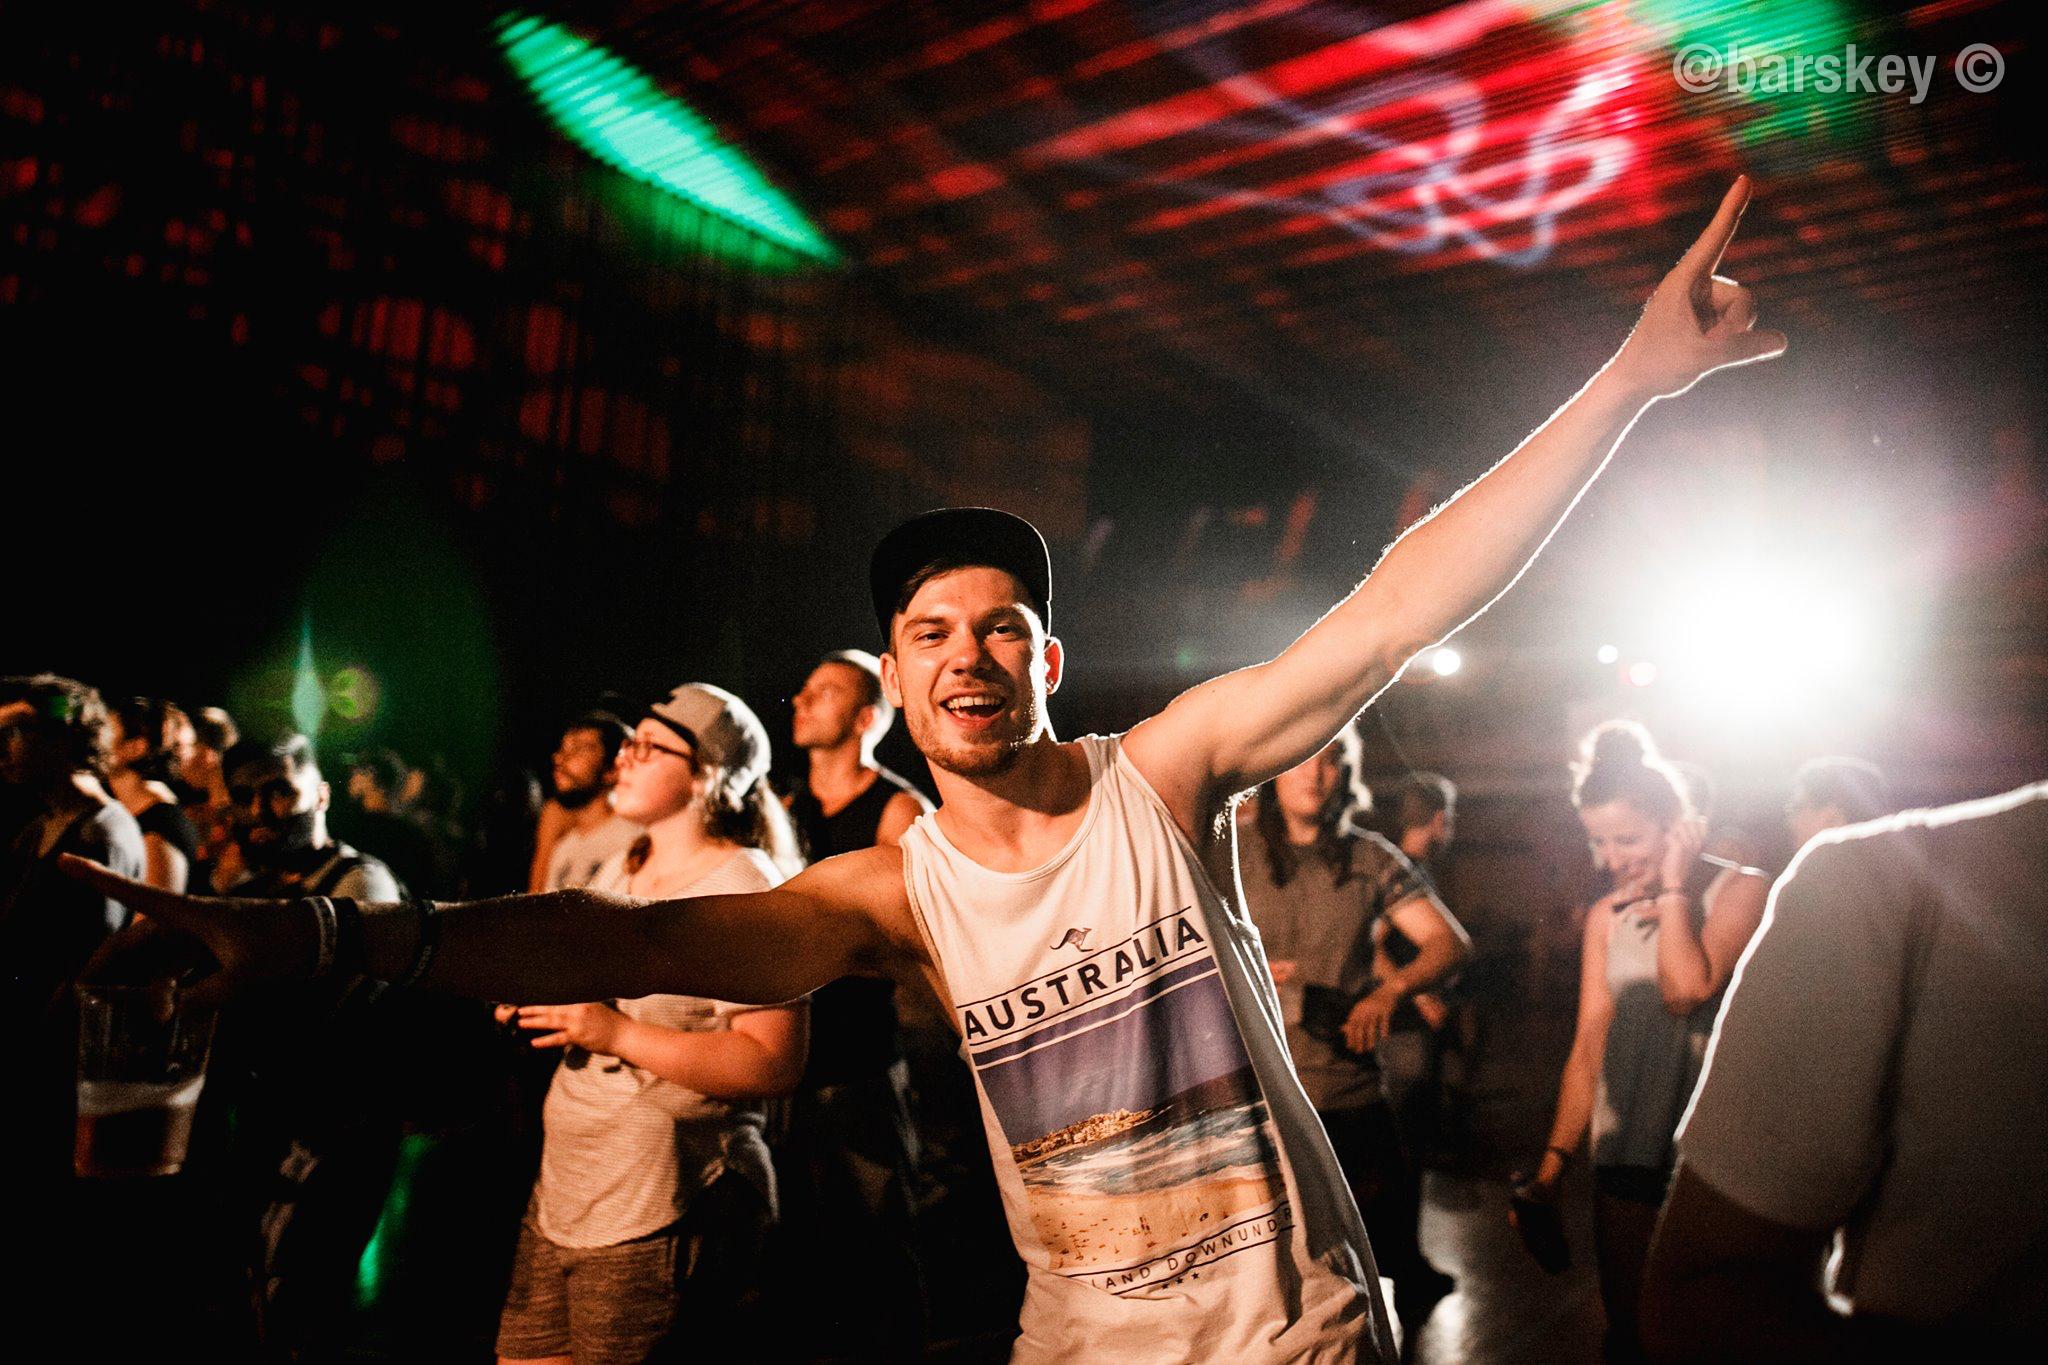 Slovakian beatboxer Rushin posing for the camera